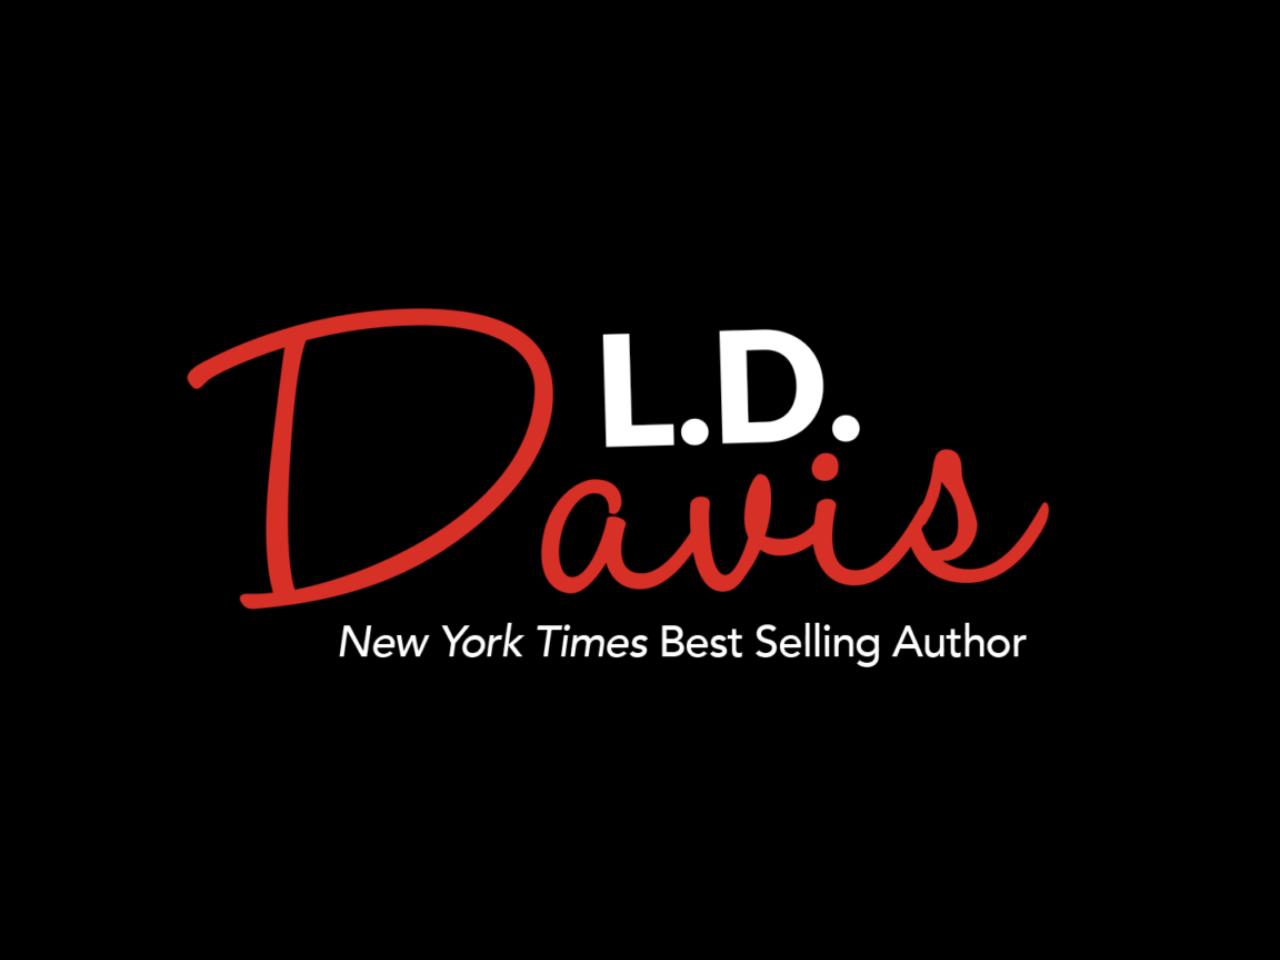 L.D. Davis, New York Times Best Selling Author